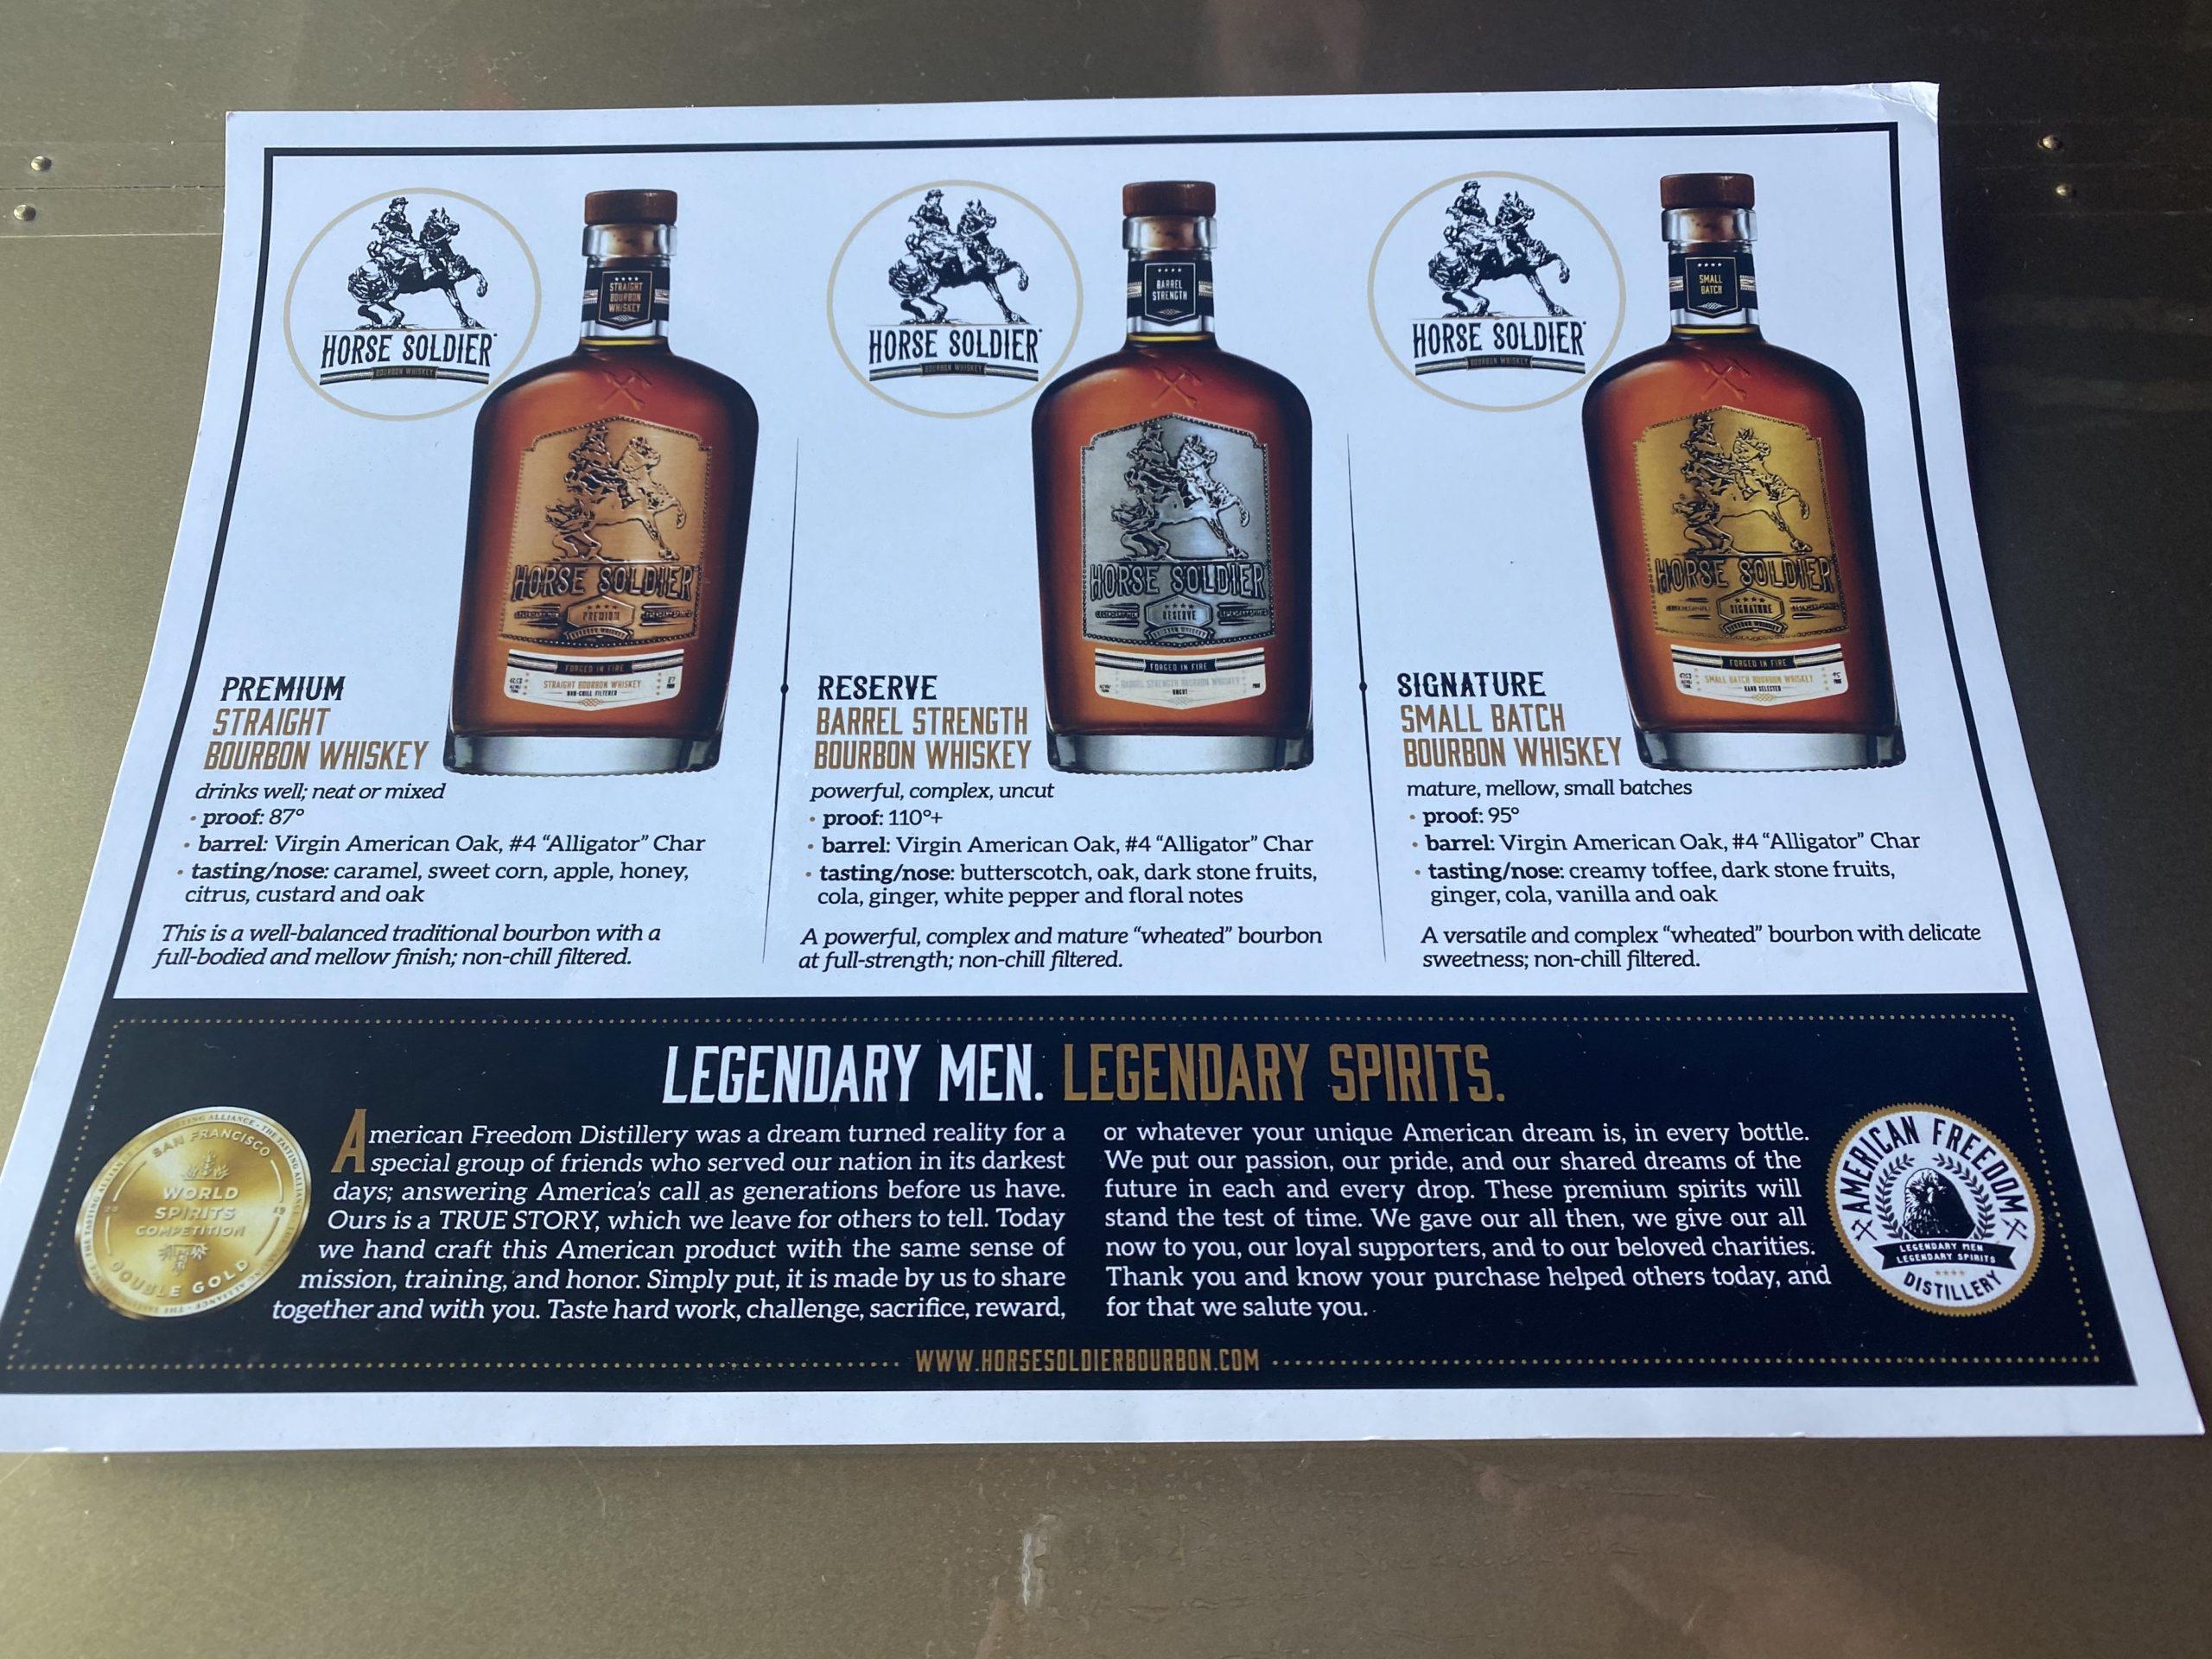 Horse Soldier Bourbon Tasting Flight